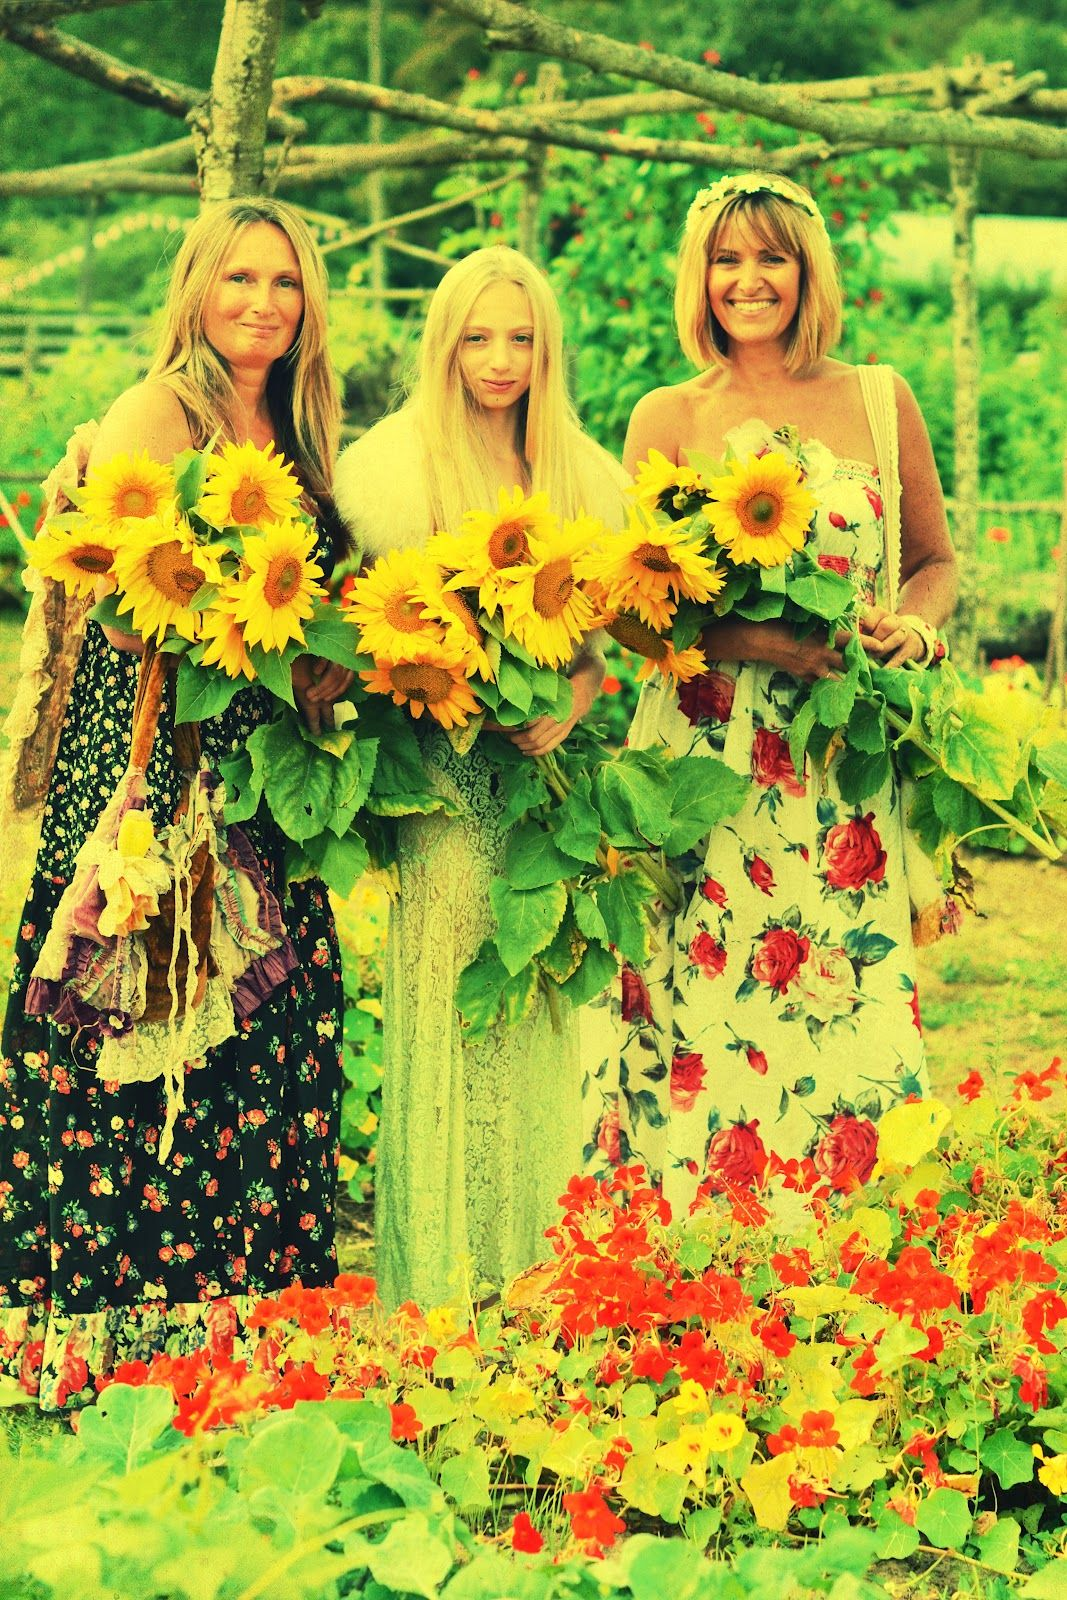 sunflowers & hippies